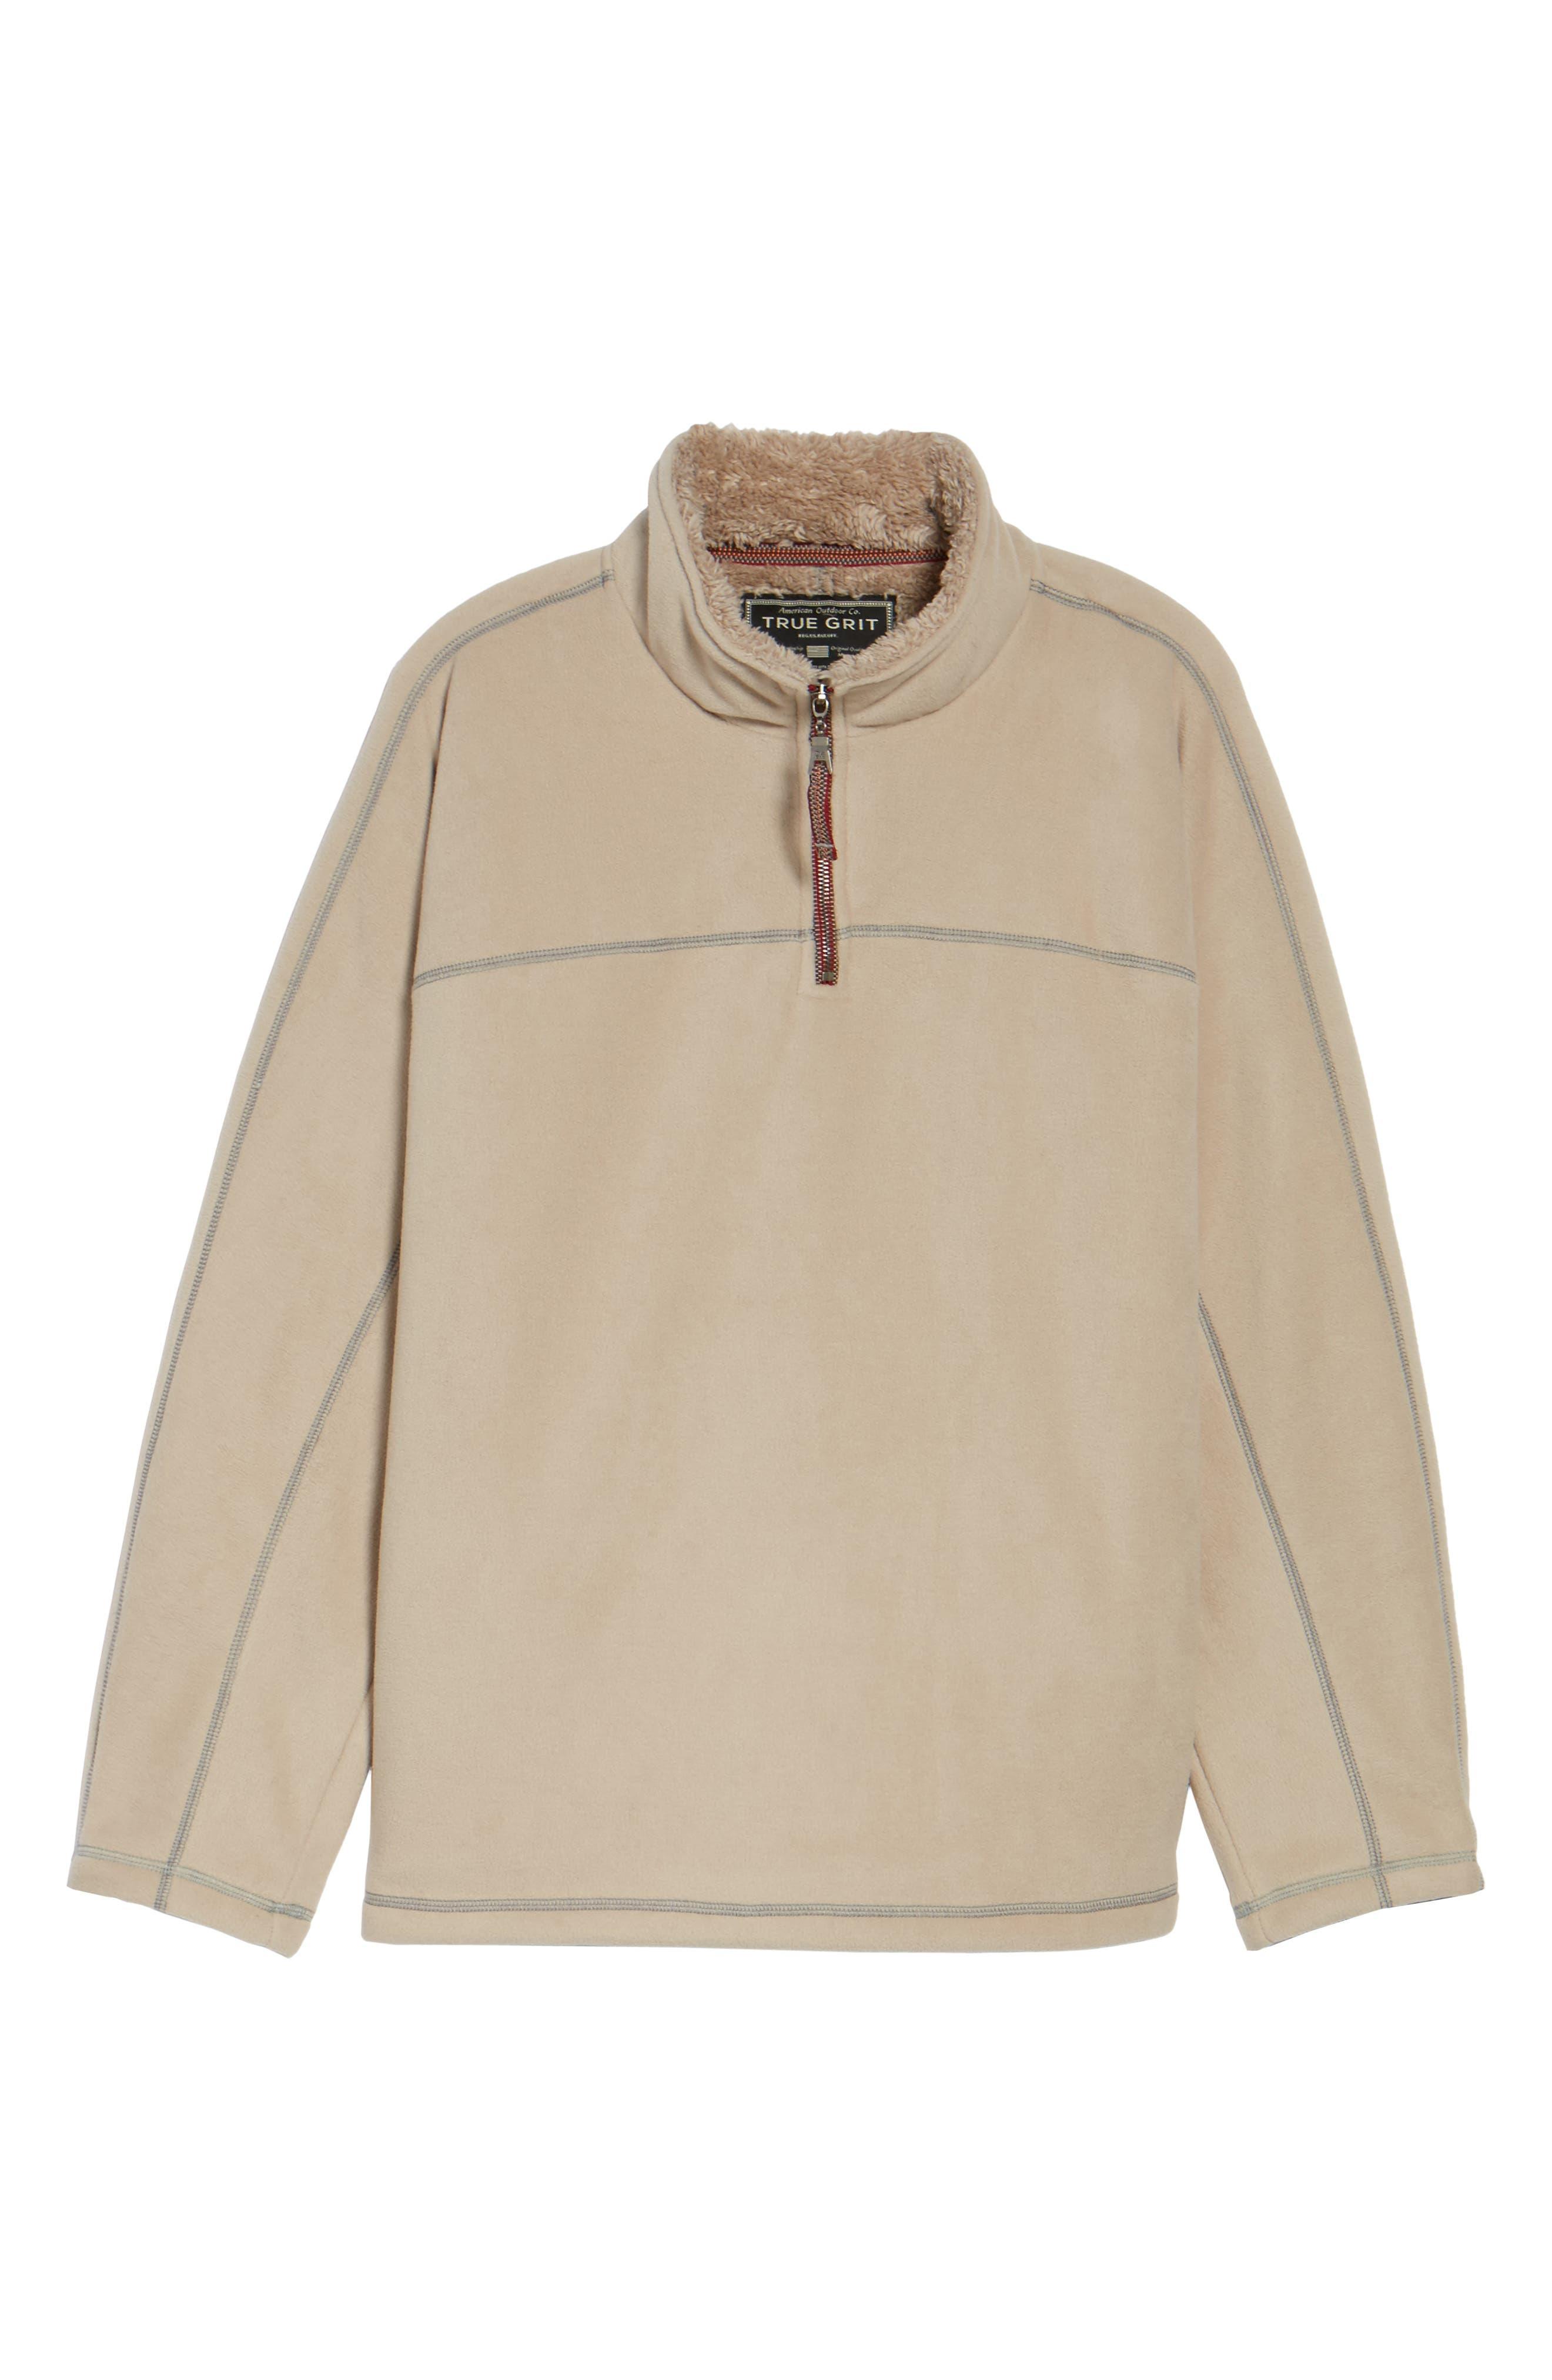 Bonded Polar Fleece Lined Pullover,                             Alternate thumbnail 6, color,                             249